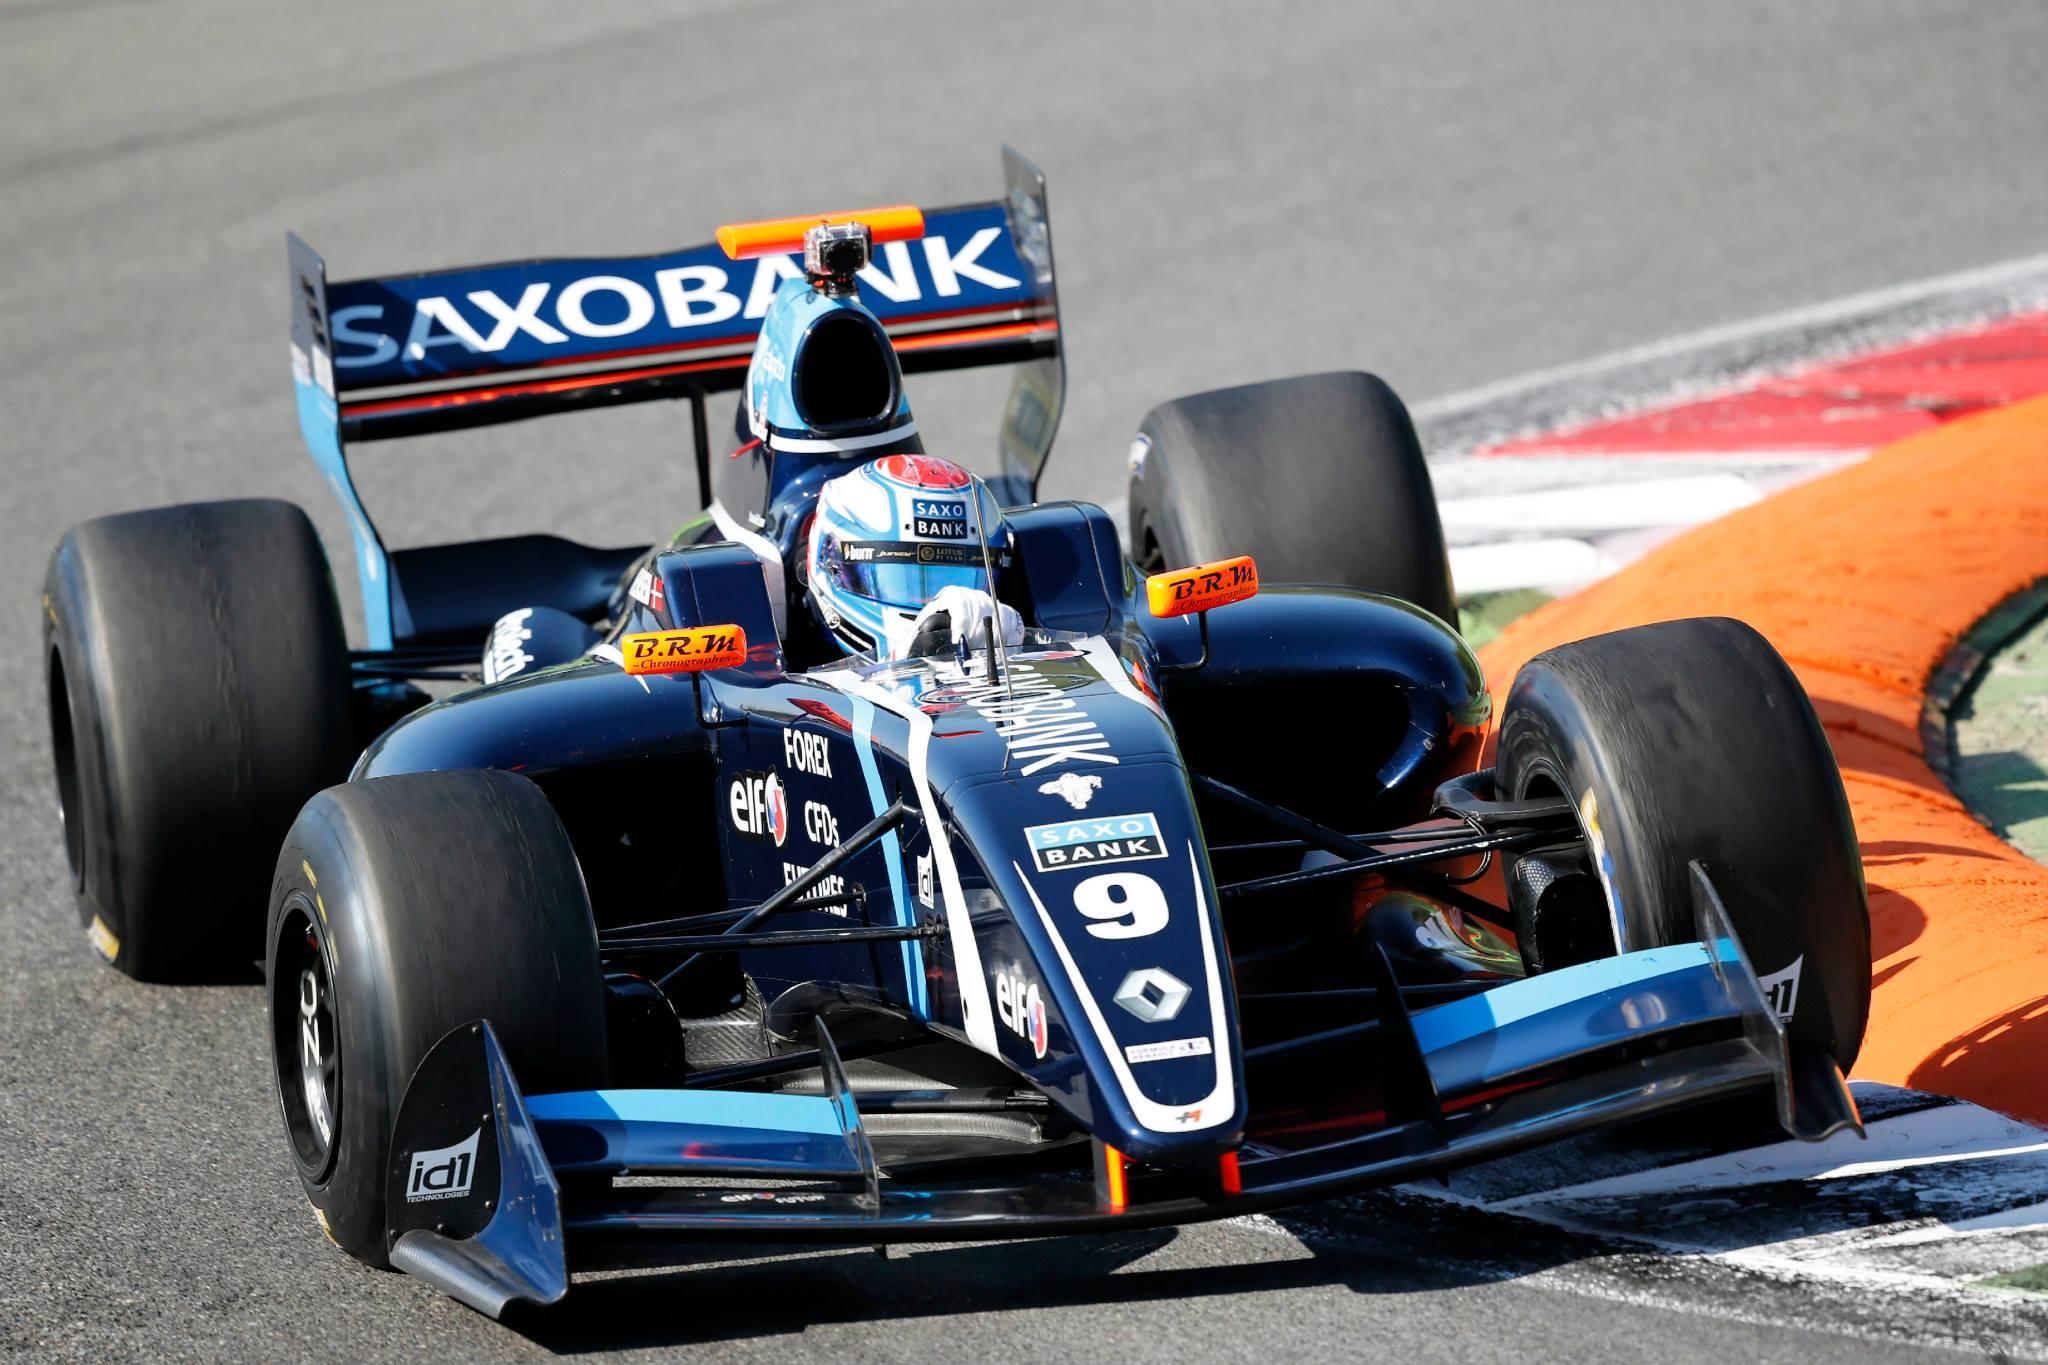 2014 Formula Renault 3.5 Series – Monza – Marcos Sorensen